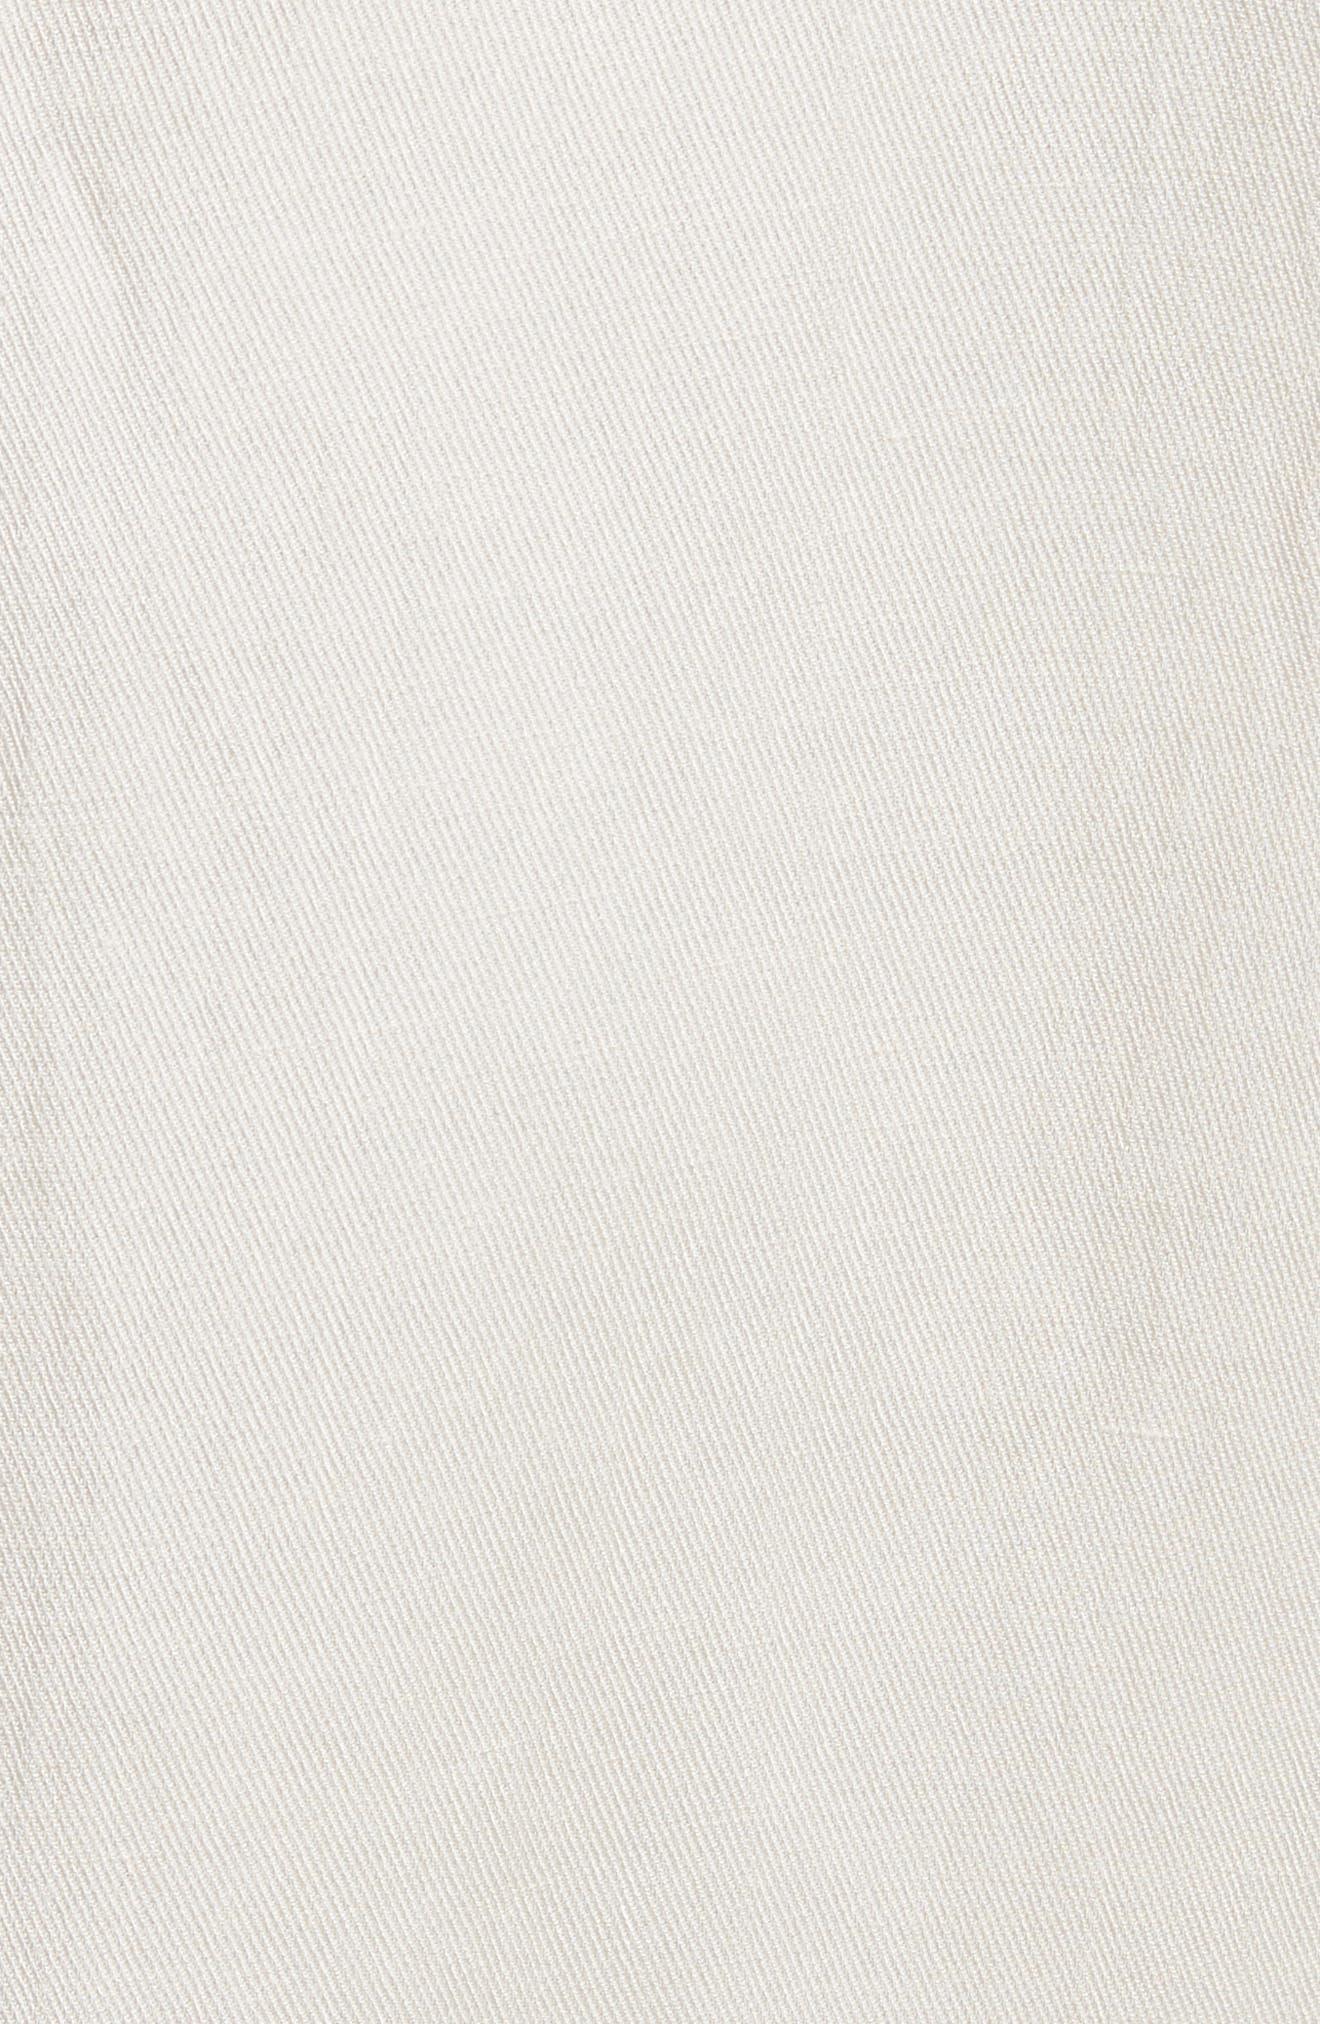 Colorblock Dress,                             Alternate thumbnail 6, color,                             902